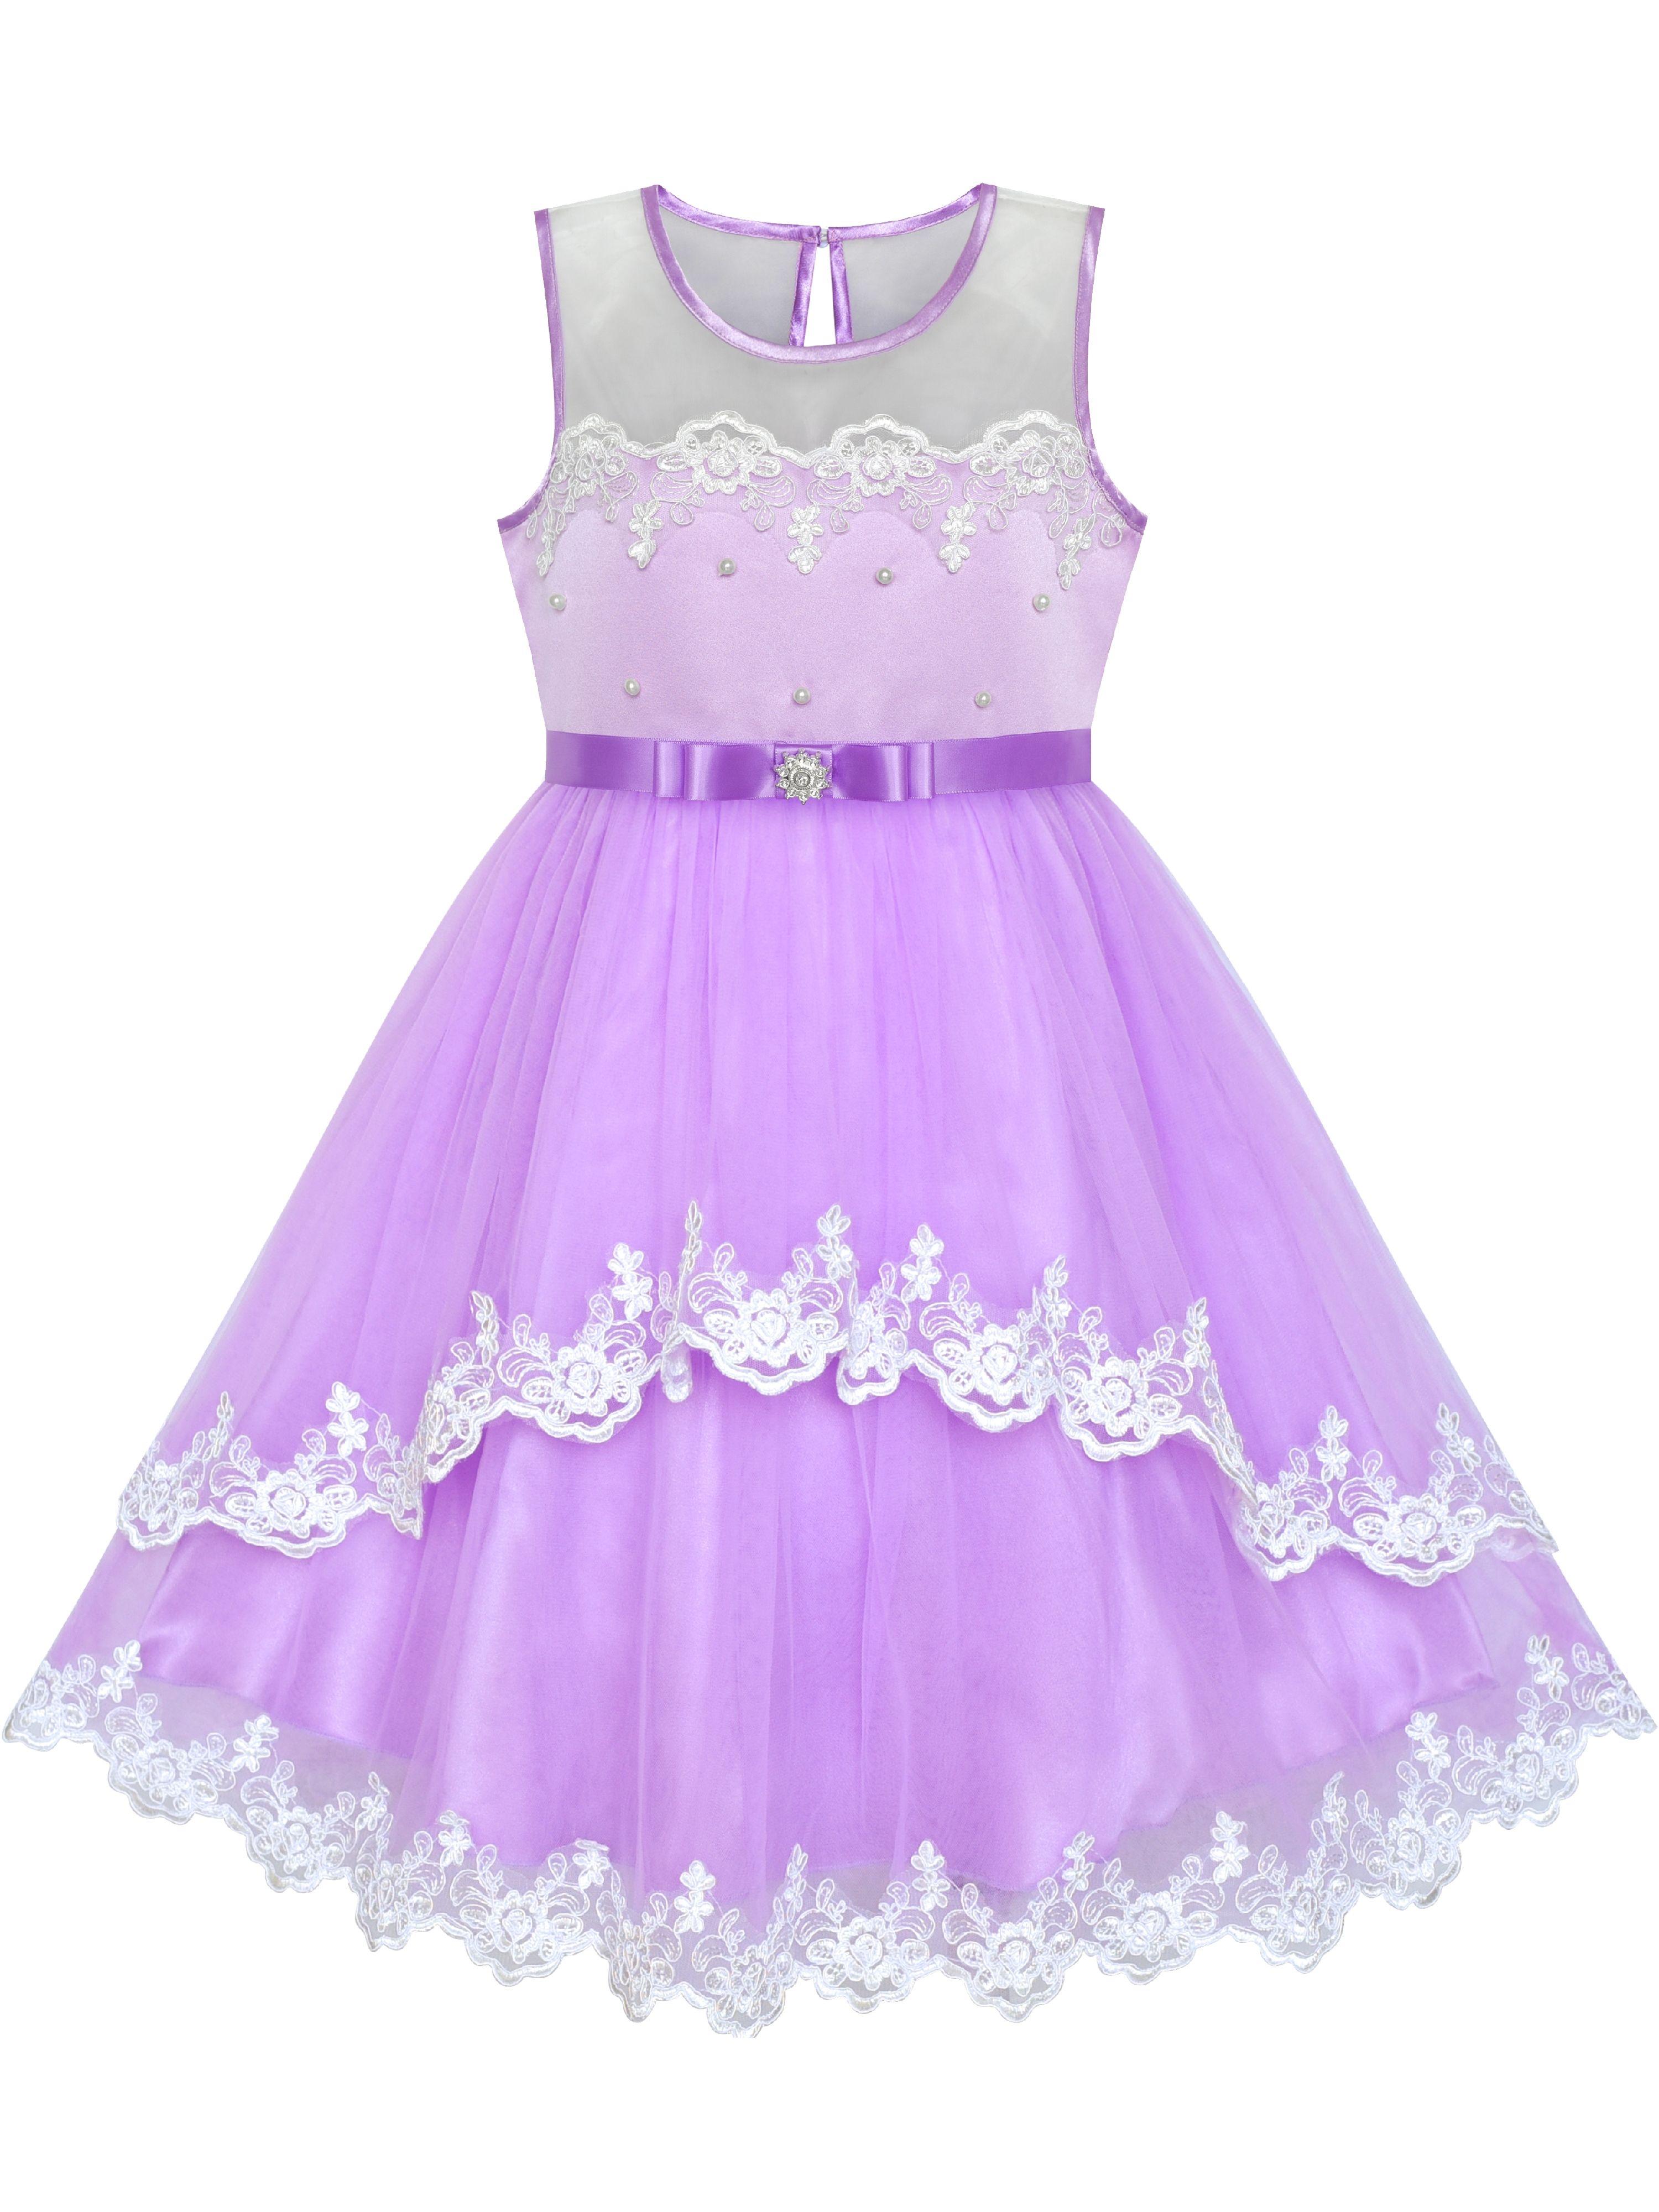 Sunny Fashion Flower Girls Dress Purple Lace Belted Wedding Party 6 Years Walmart Com In 2021 Purple Girls Dress Purple Flower Girl Dress Girls Blue Dress [ 4000 x 3000 Pixel ]